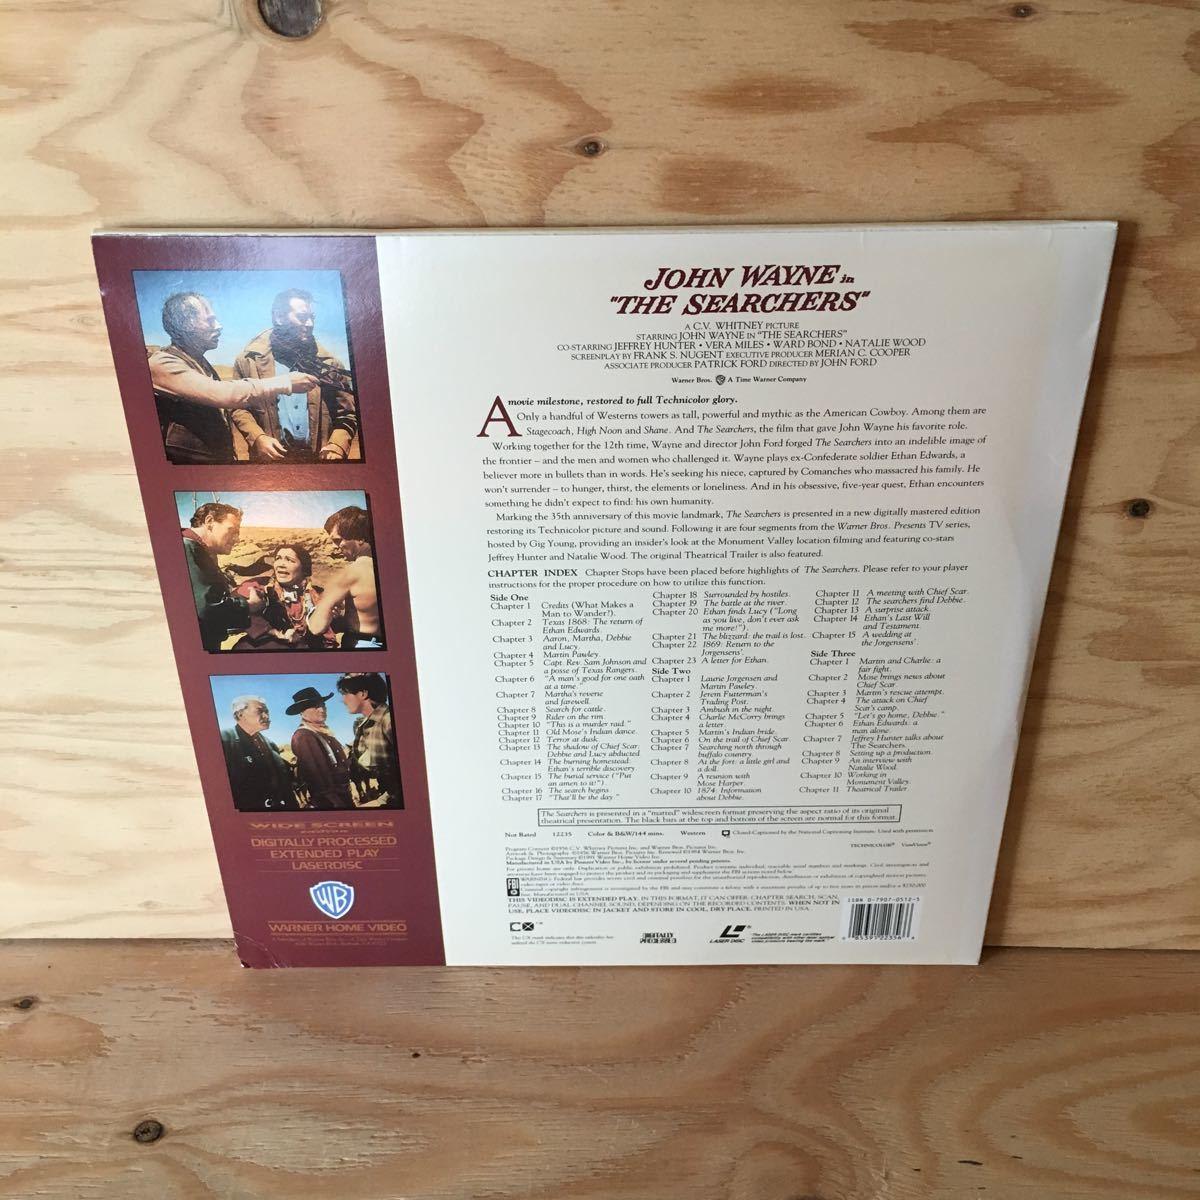 ◎3FJJB-200210 レア[JOHN WAYNE in THE SEARCHERS 輸入盤]LD レーザーディスク JOHN FORD_画像2